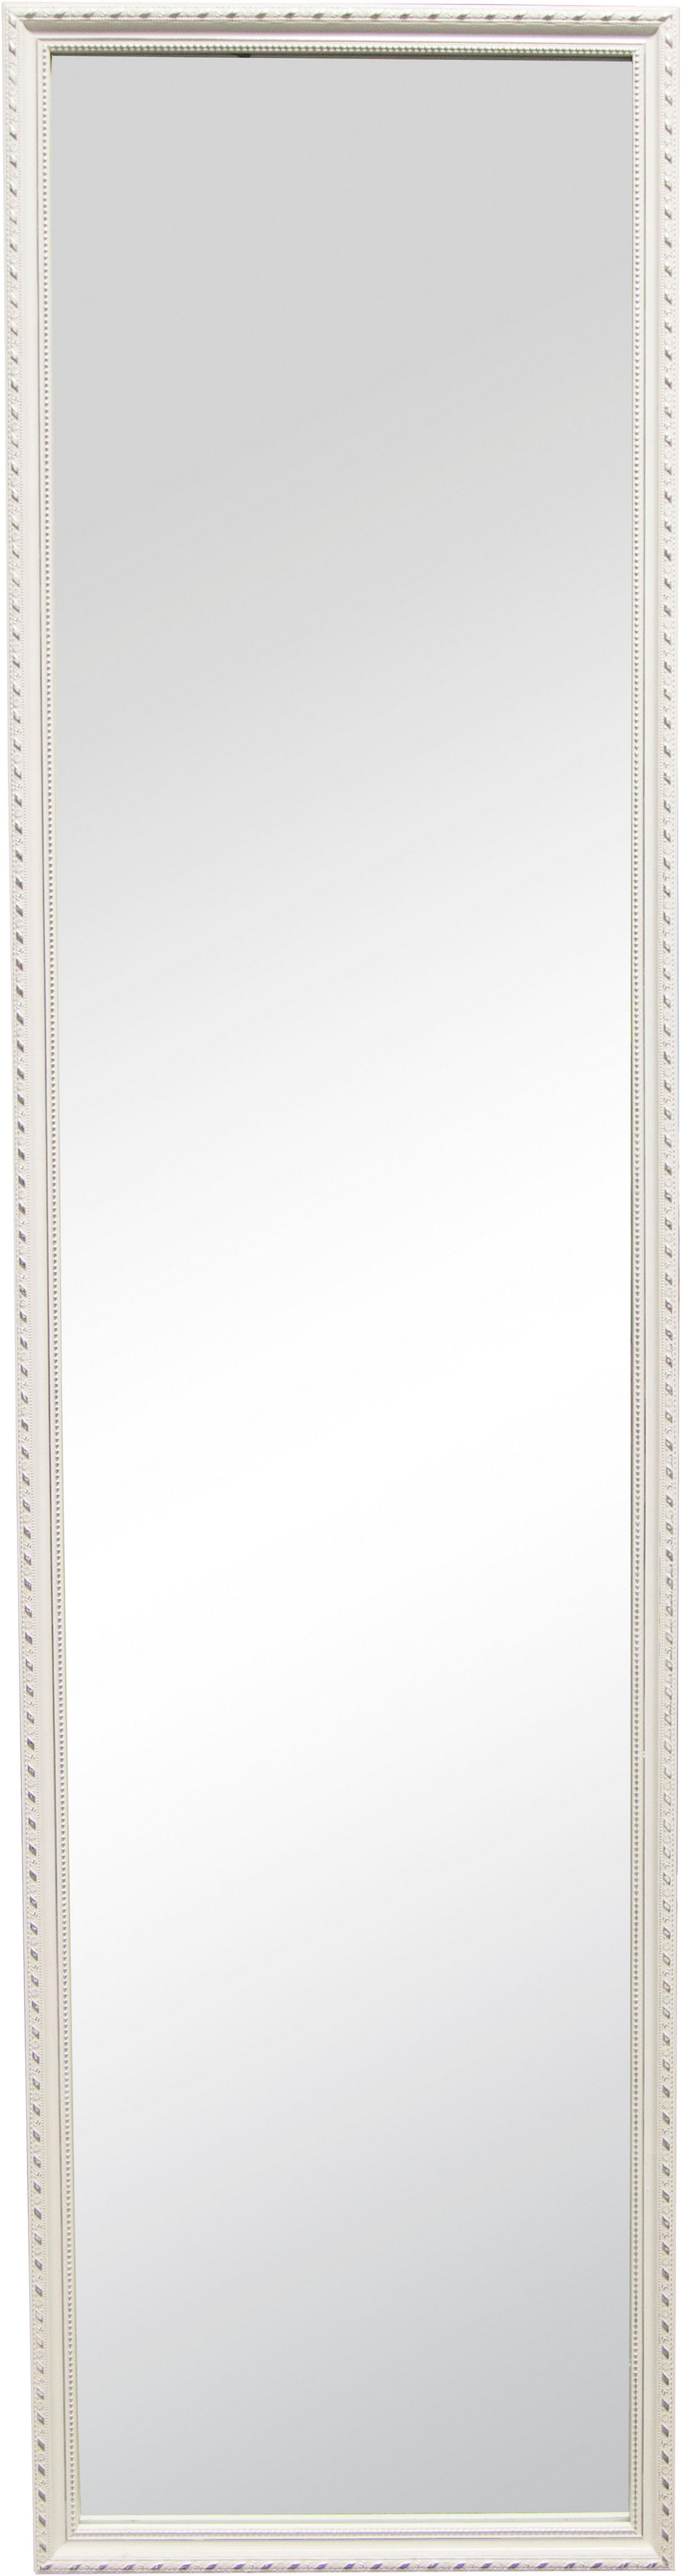 Home affaire verticale spiegel Lisa (1 stuk) - gratis ruilen op otto.nl